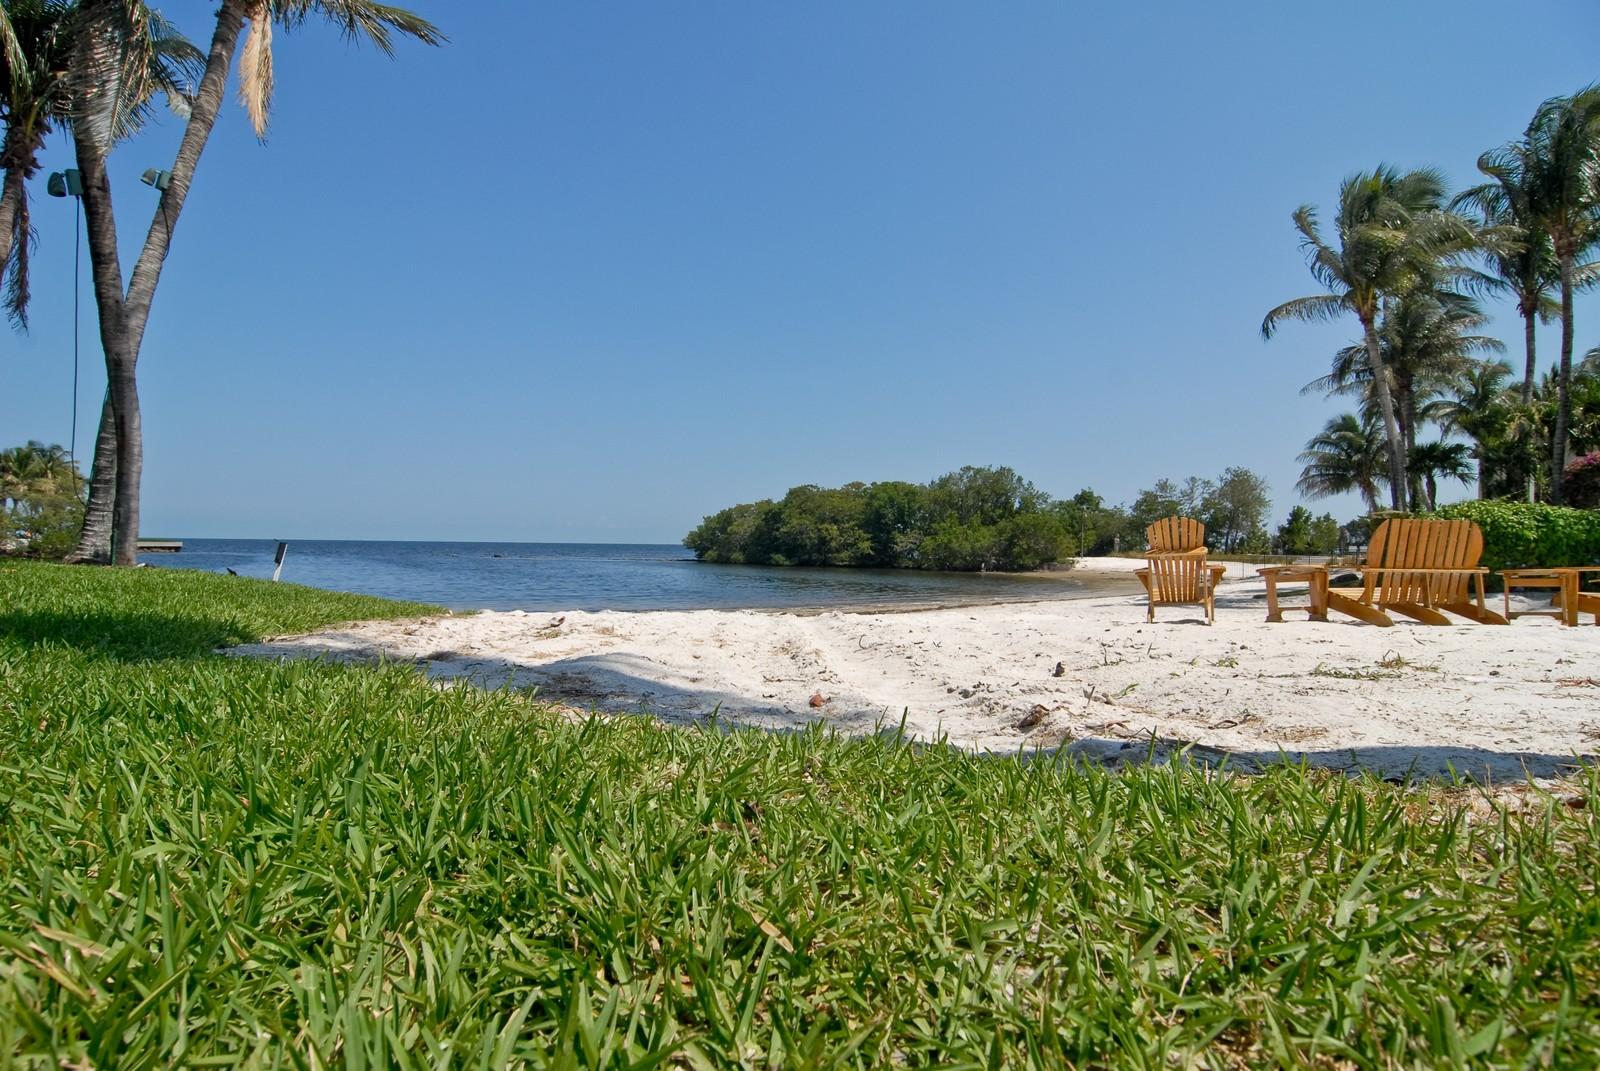 Real Estate Photography 24 Tahiti Beach C Gables Fl 33143